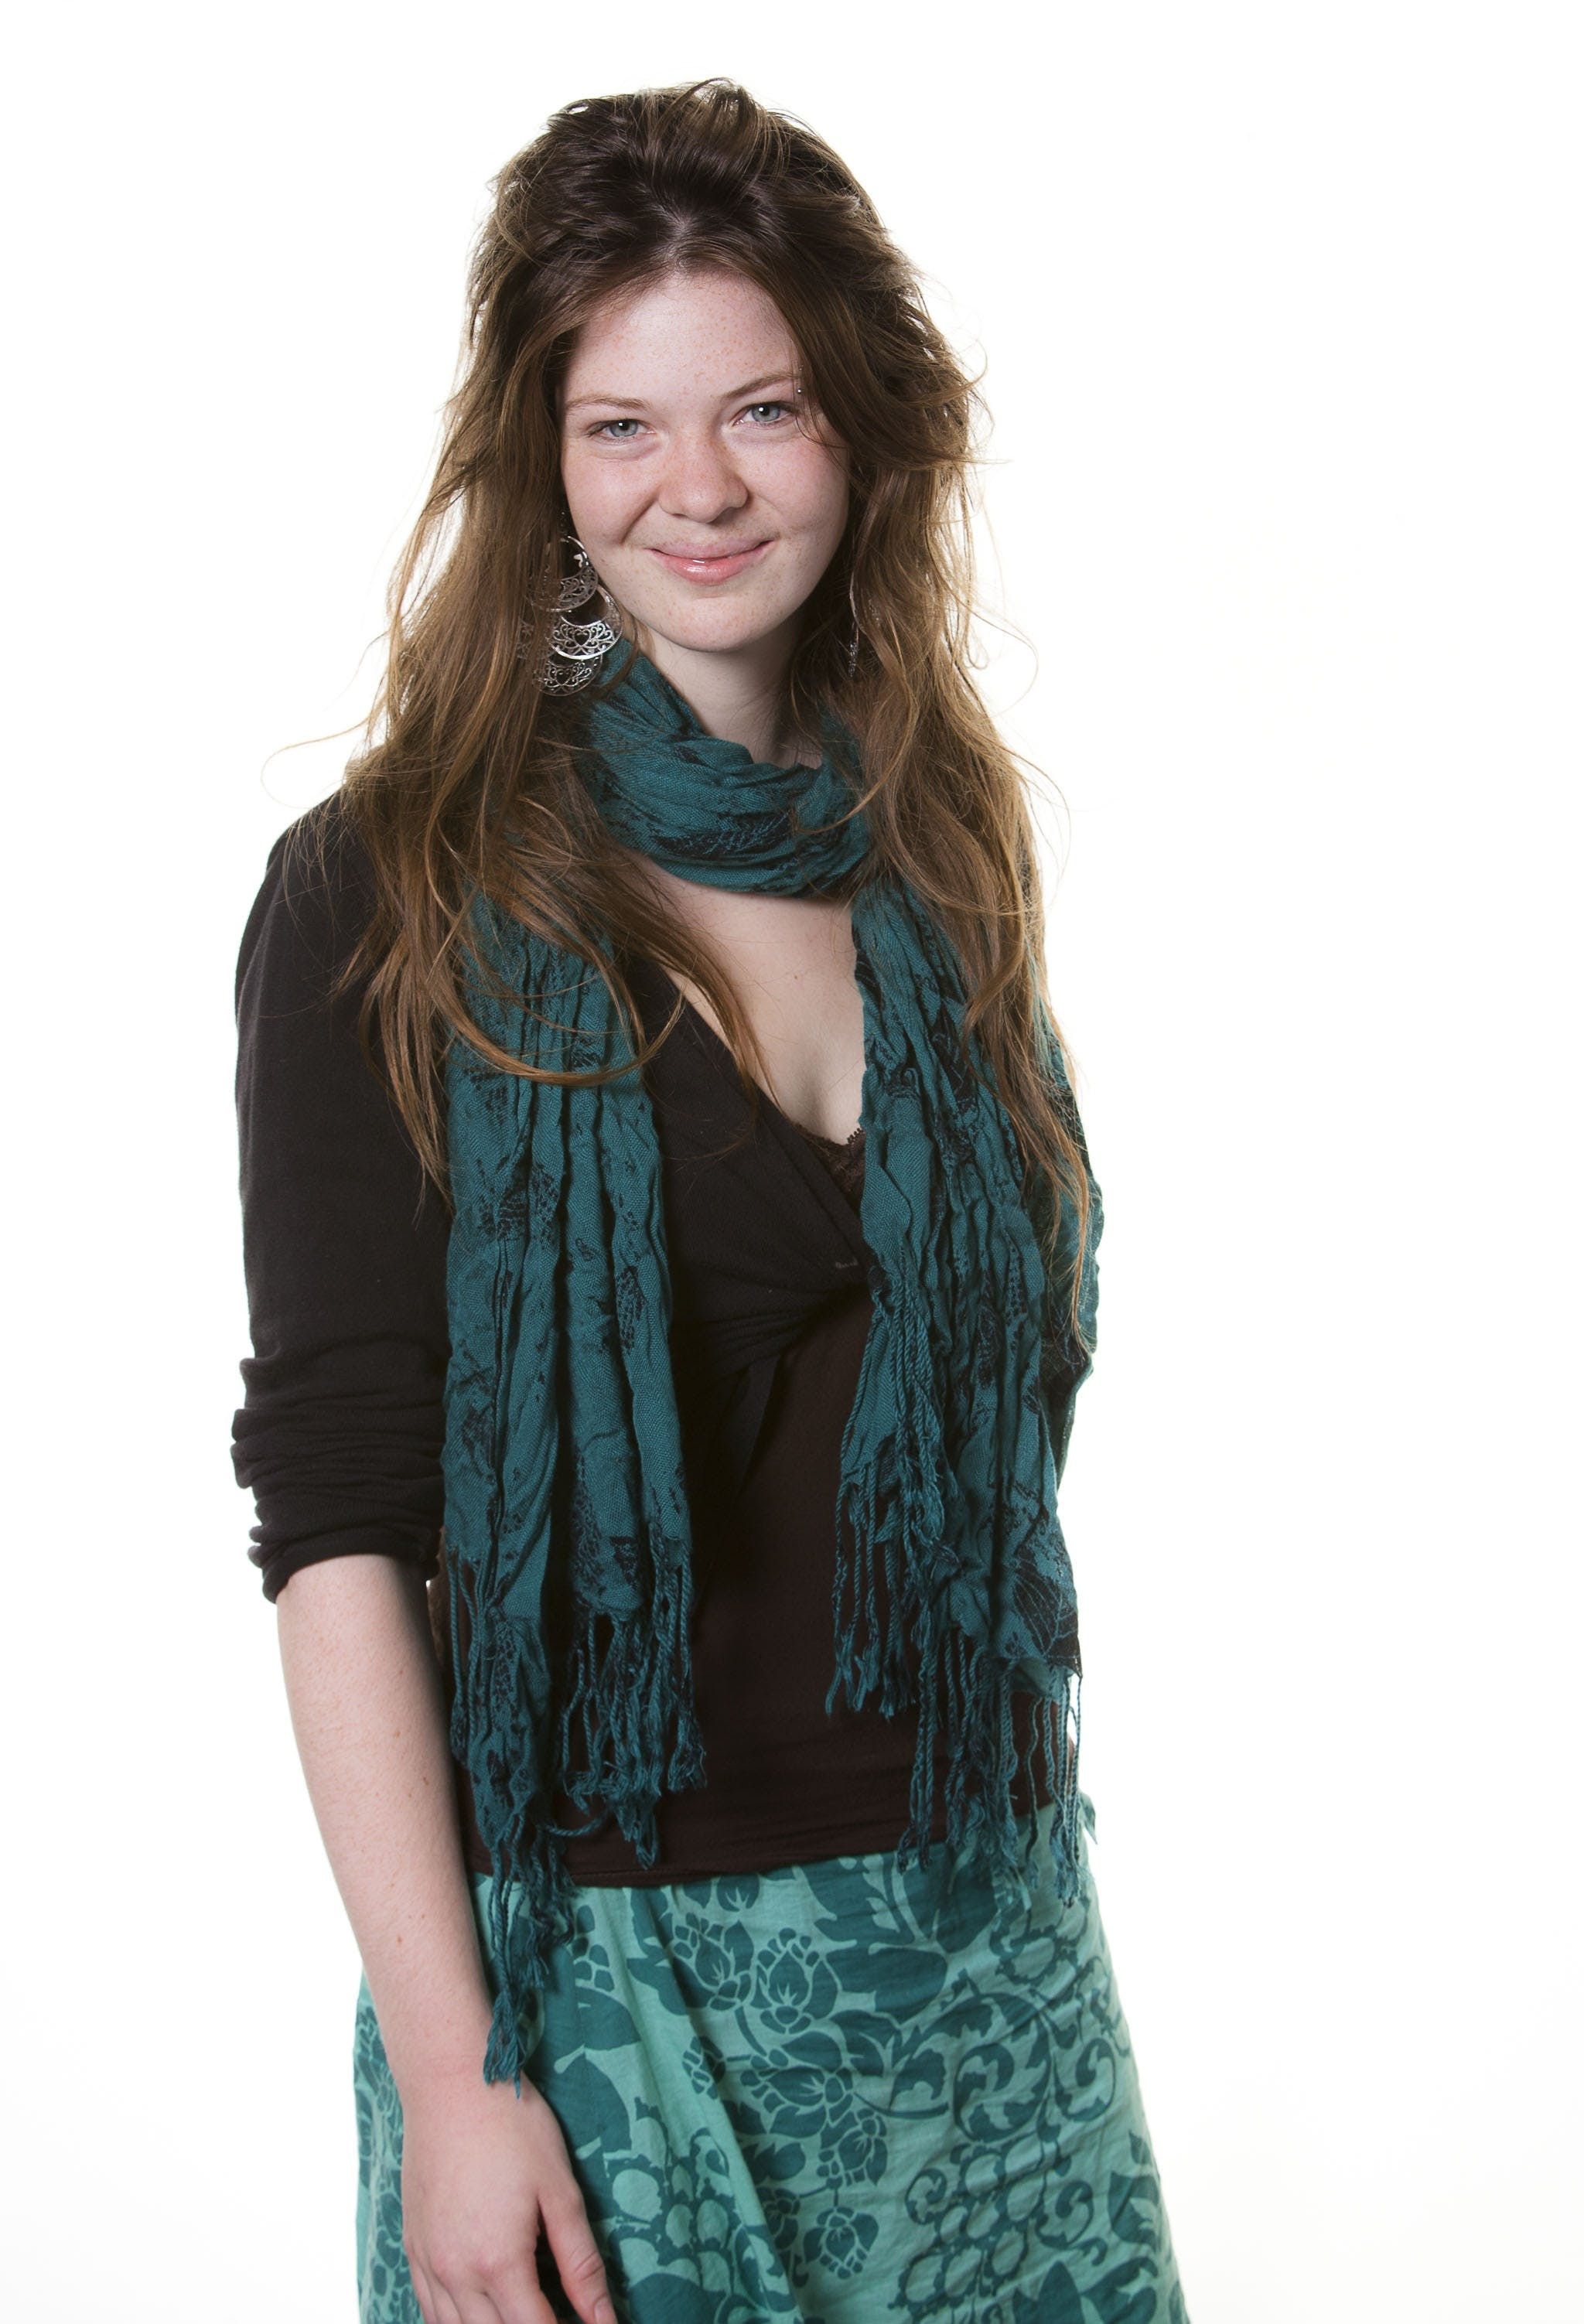 Free stock photo of blue scarf, long hair, model, portrait